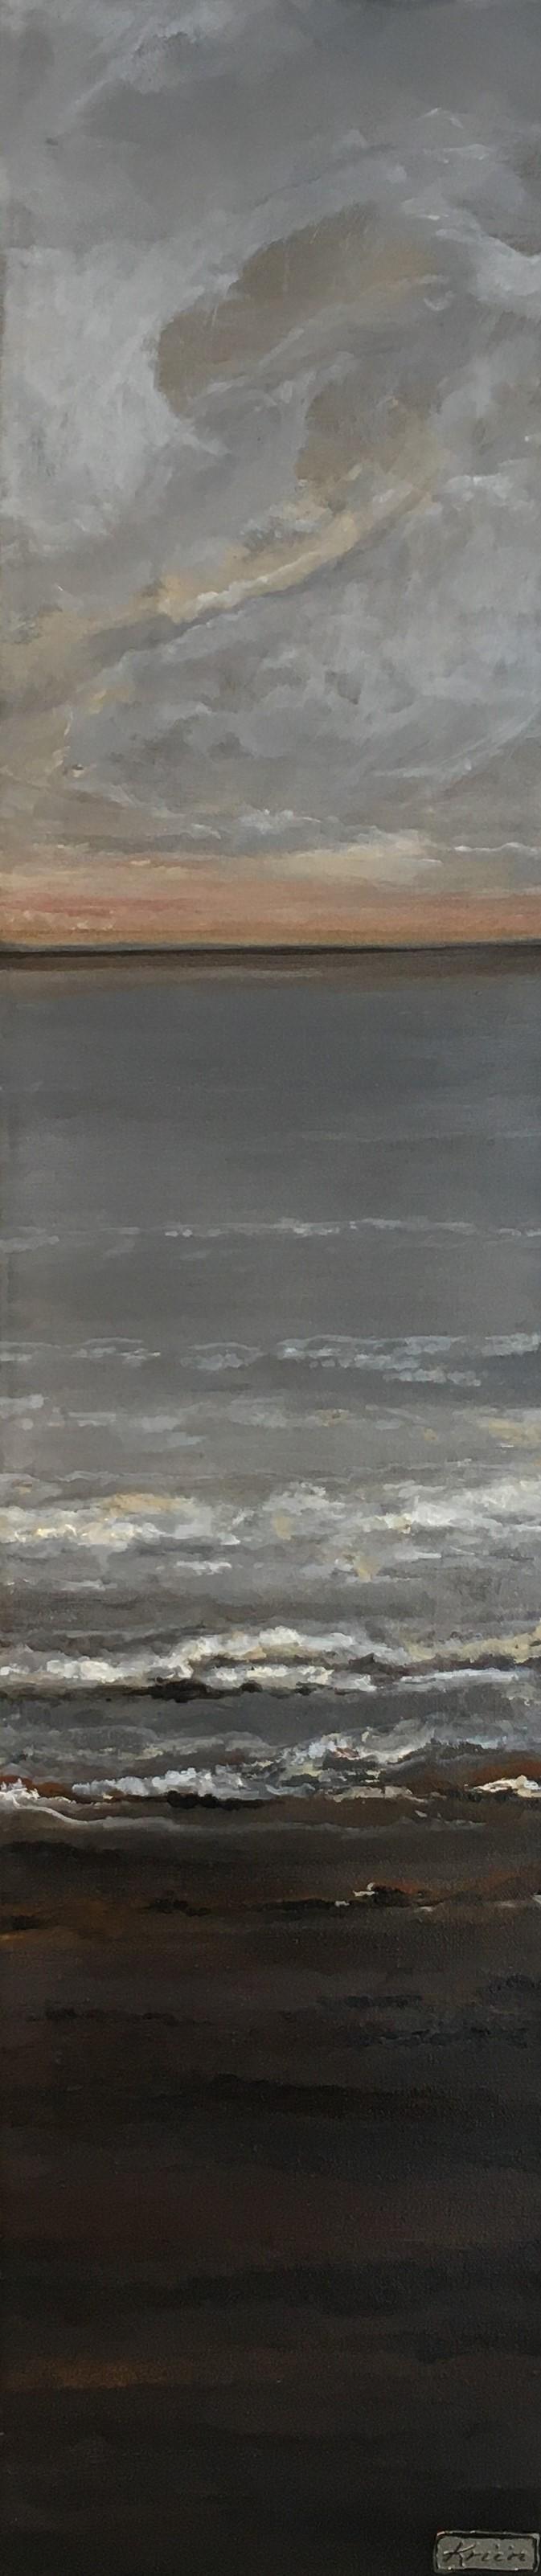 Seascape no.50, (2019) Kriin